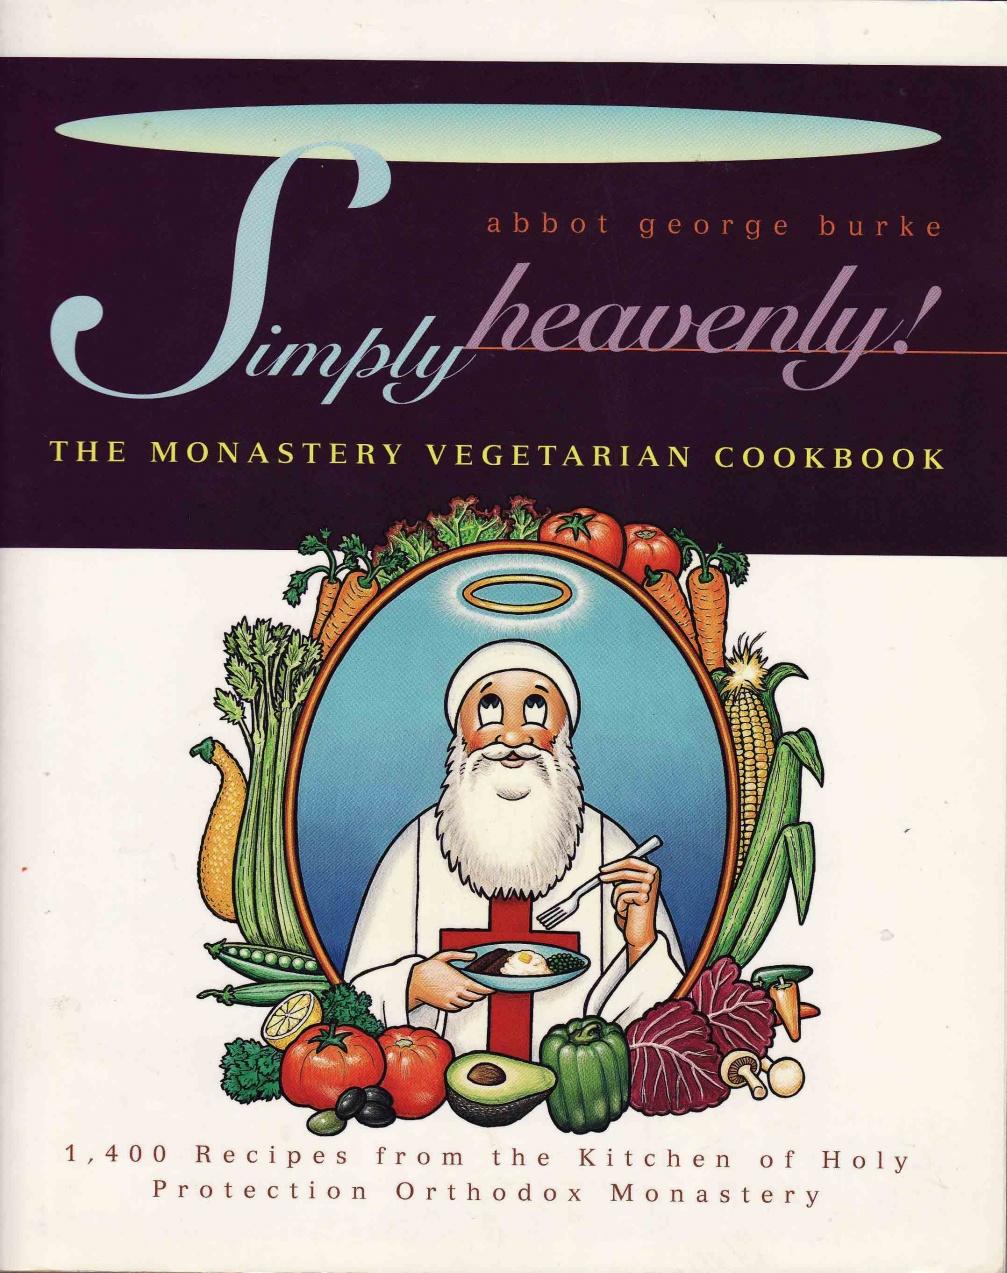 Click image for larger version  Name:cookbook.jpg Views:167 Size:421.8 KB ID:36175